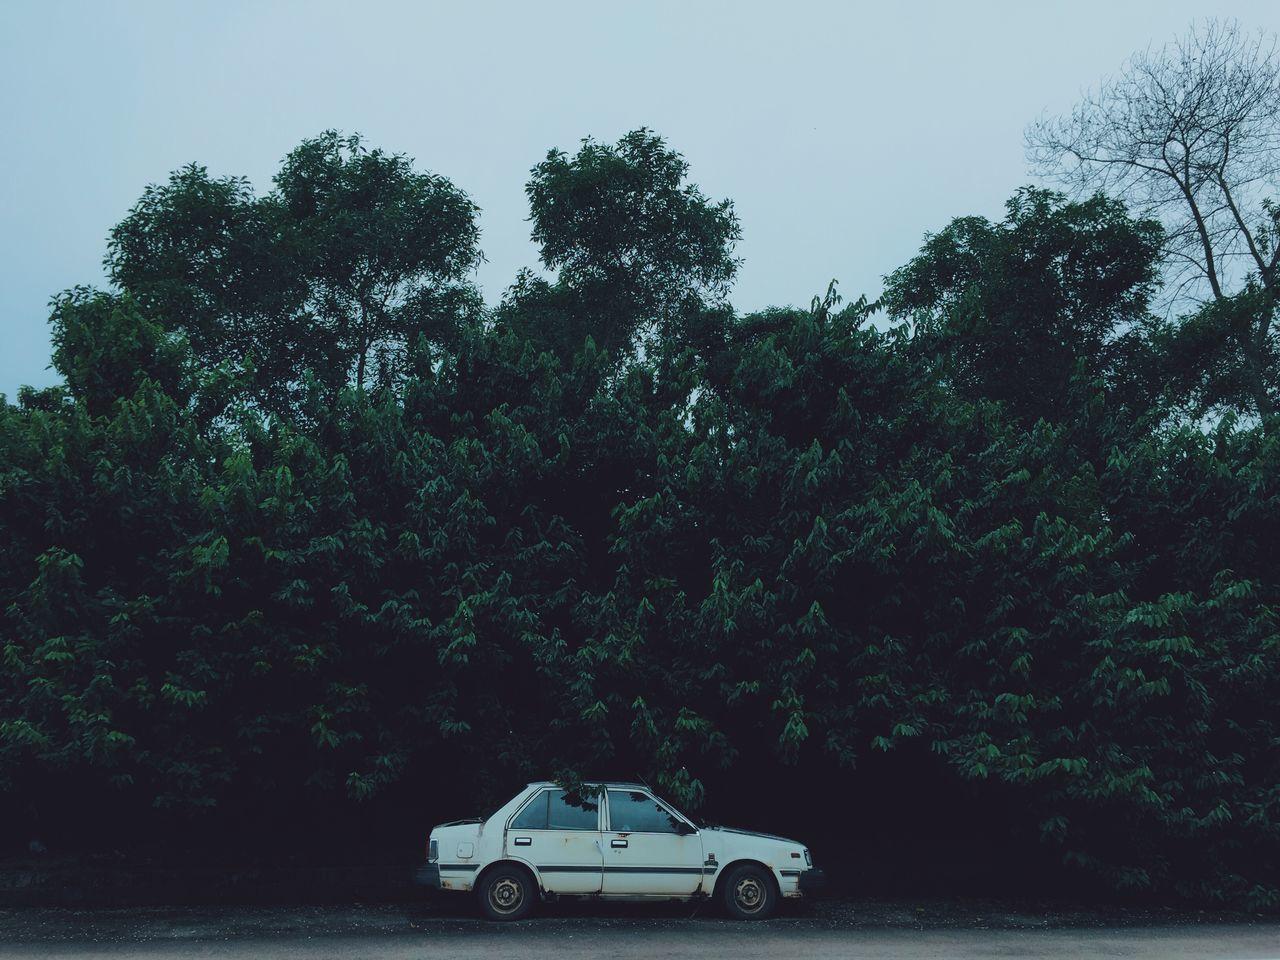 Car on street against trees